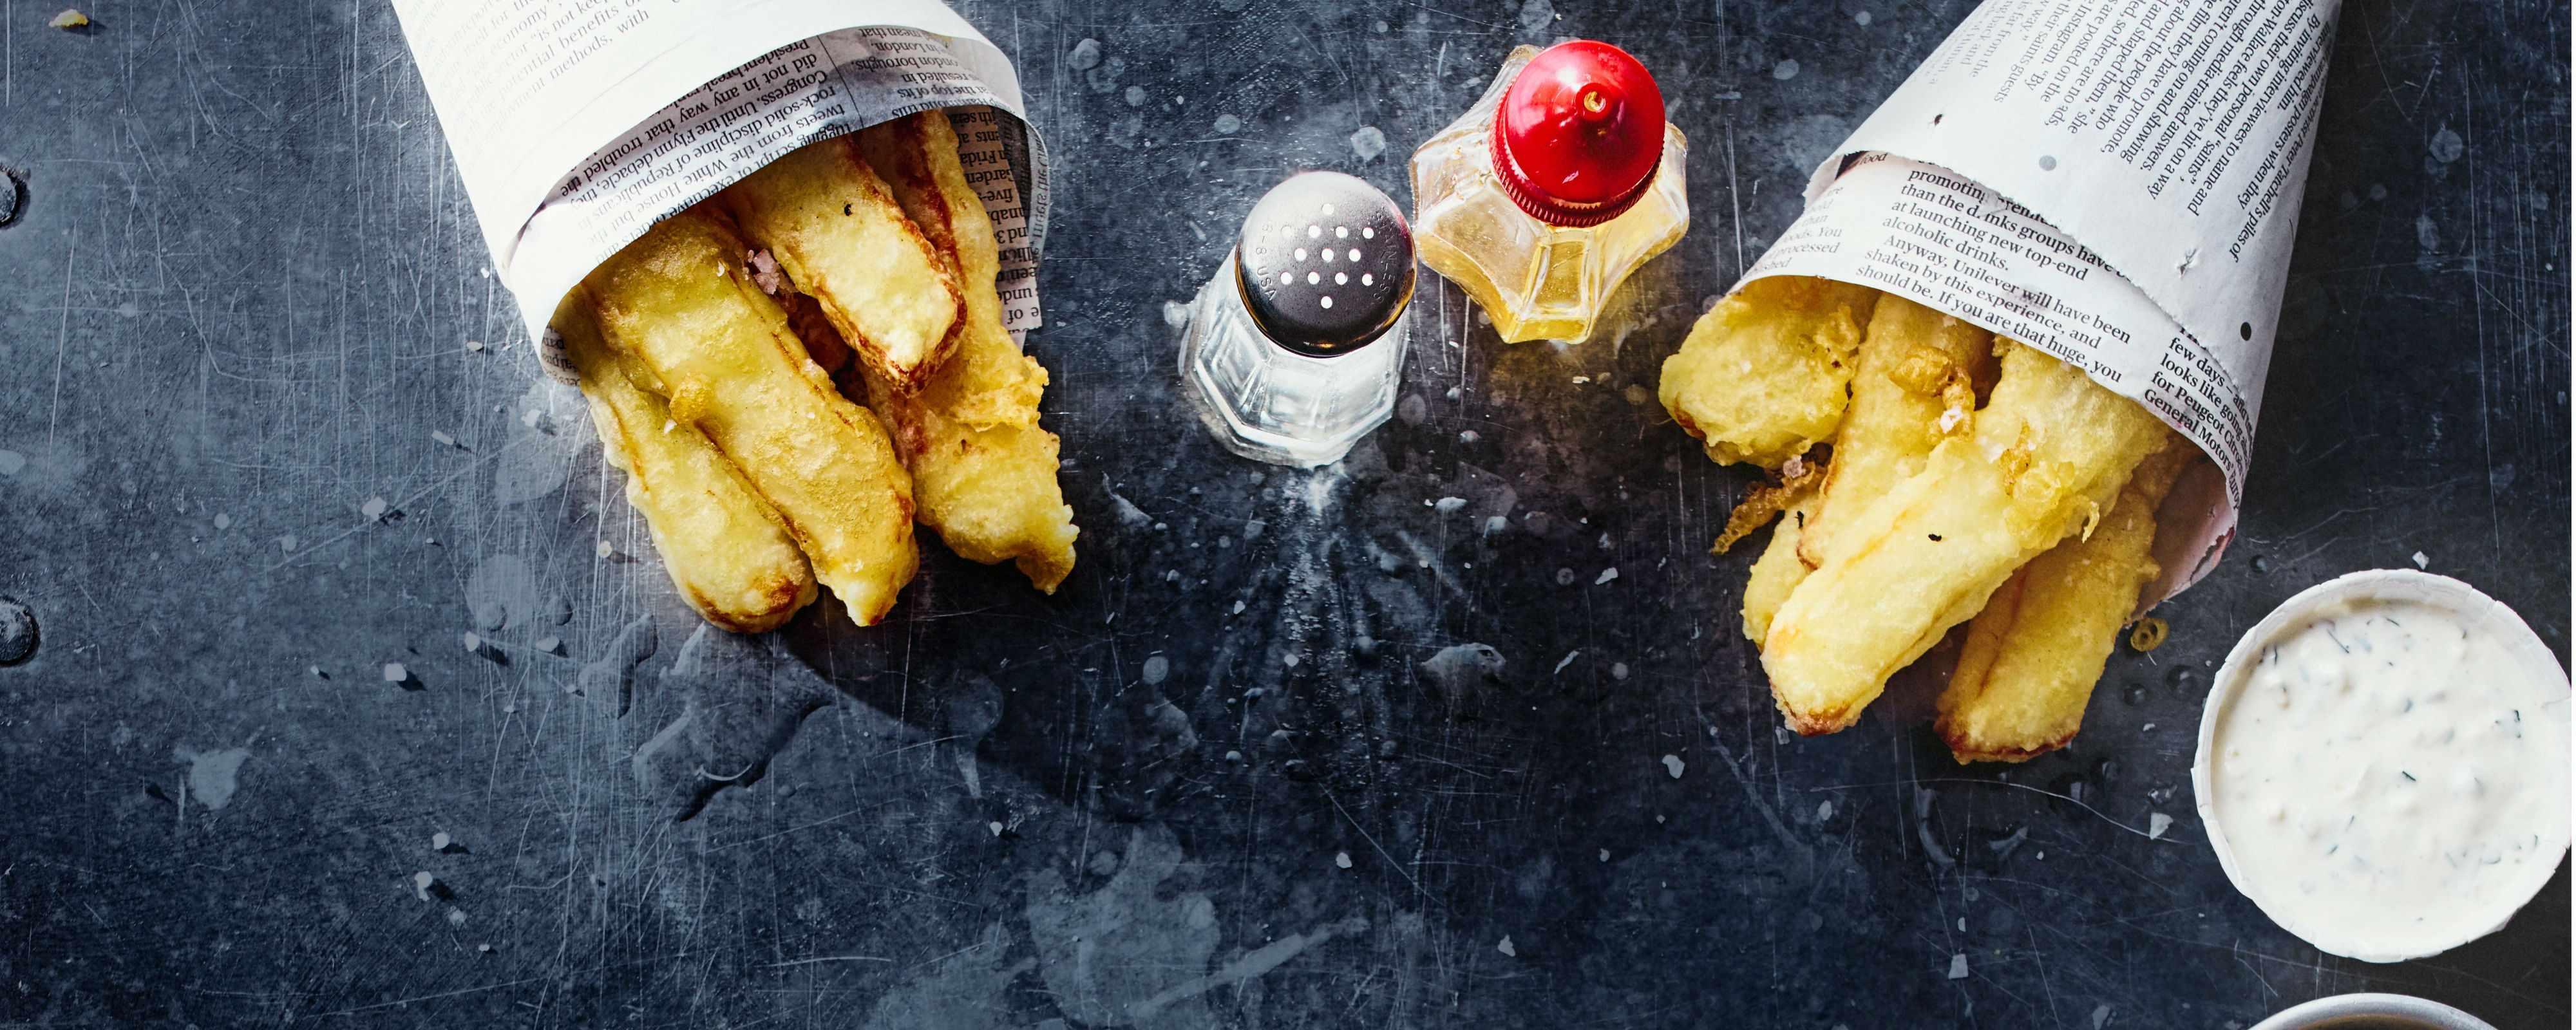 Fried Halloumi Recipe with Tartare Sauce